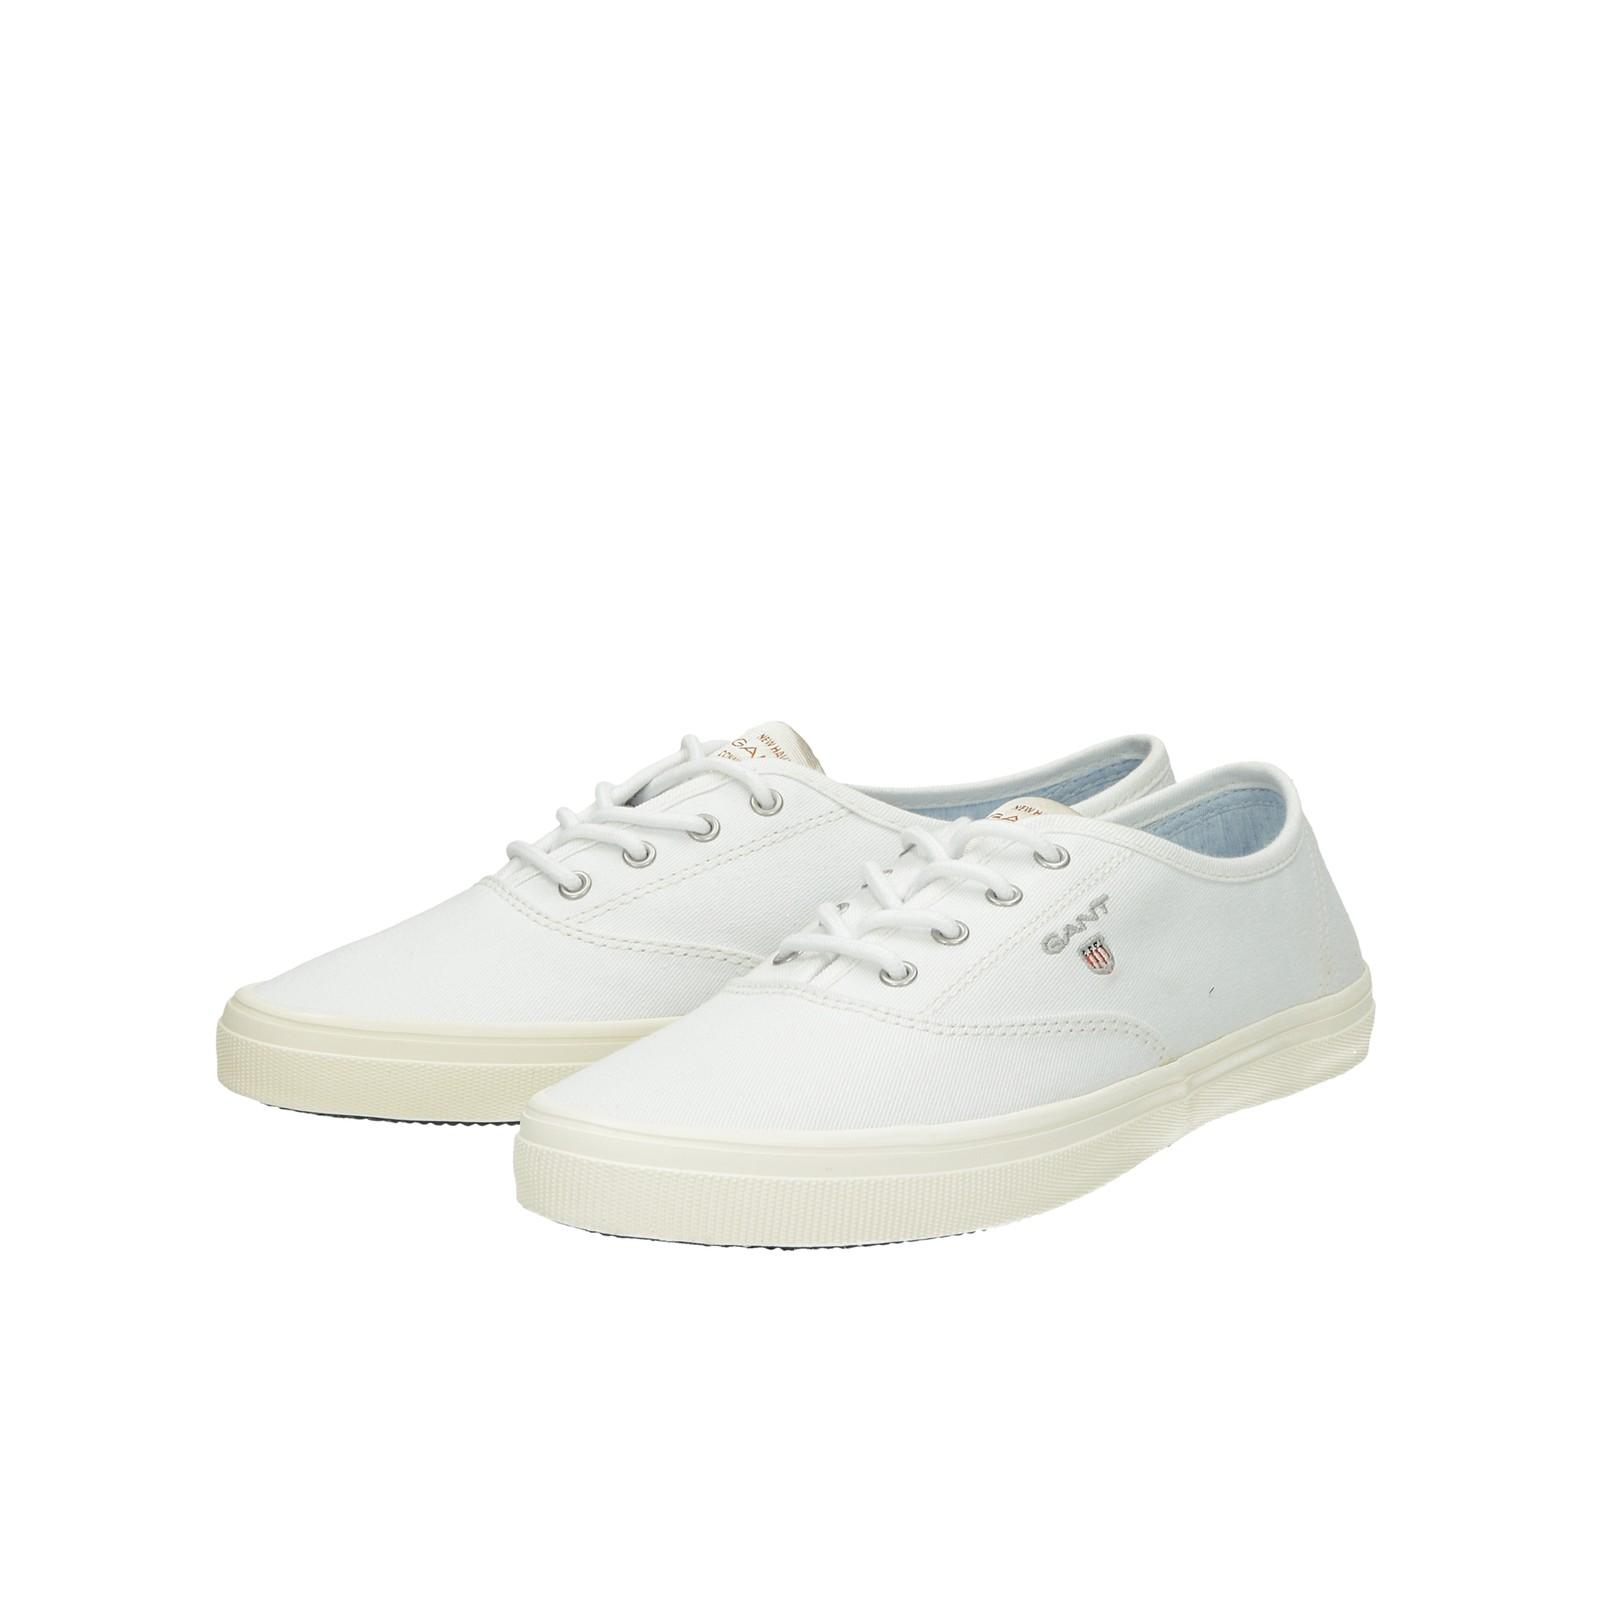 85afc2a85a474 Gant dámske textilné tenisky - biele | 18538396G290-WHT www.robel.sk